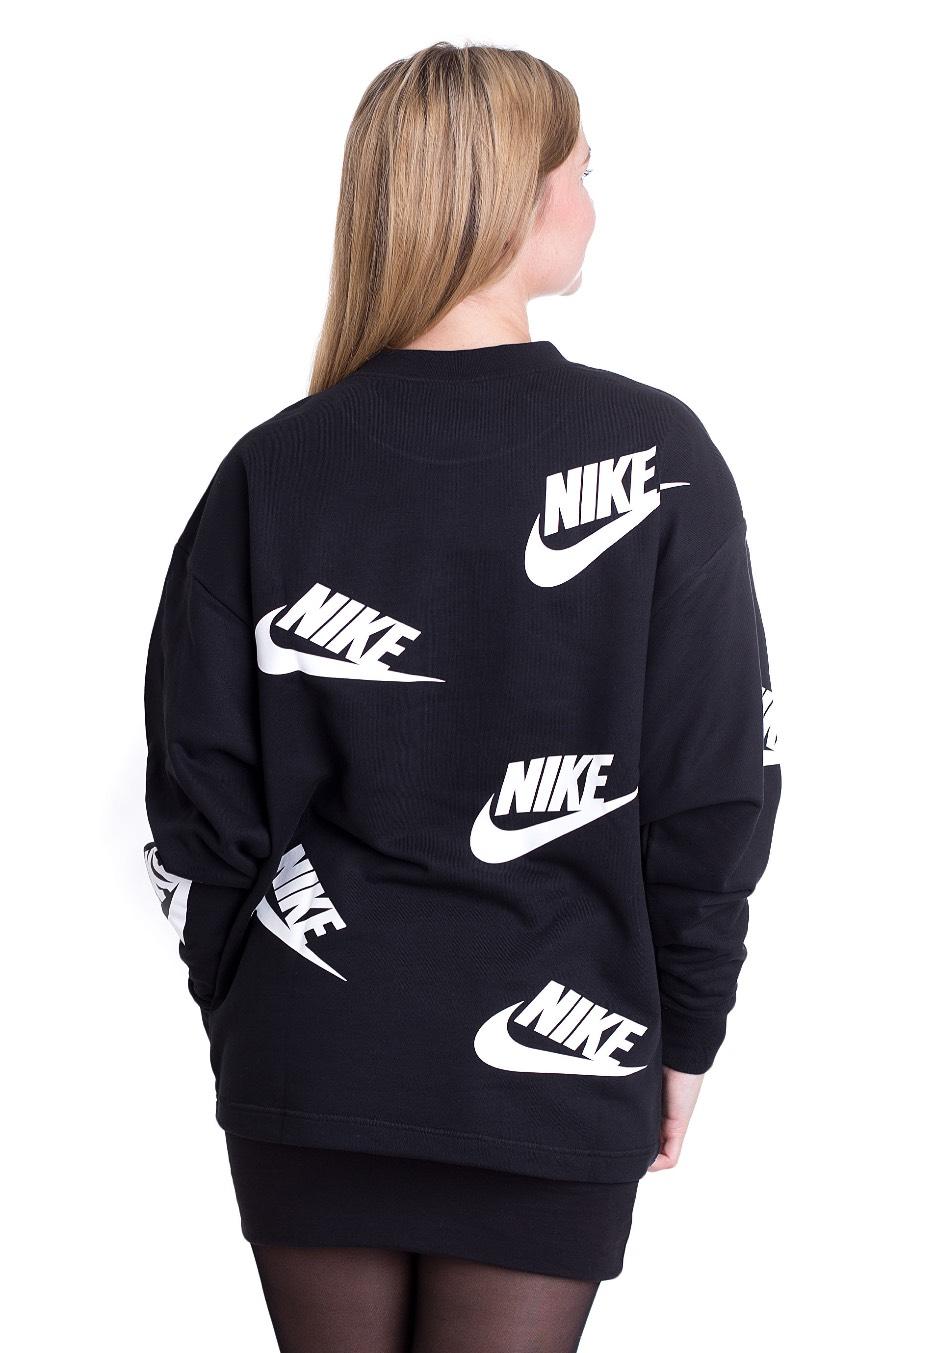 Nike Nsw Crew Futura Toss Blackwhite Pull Boutique Streetwear